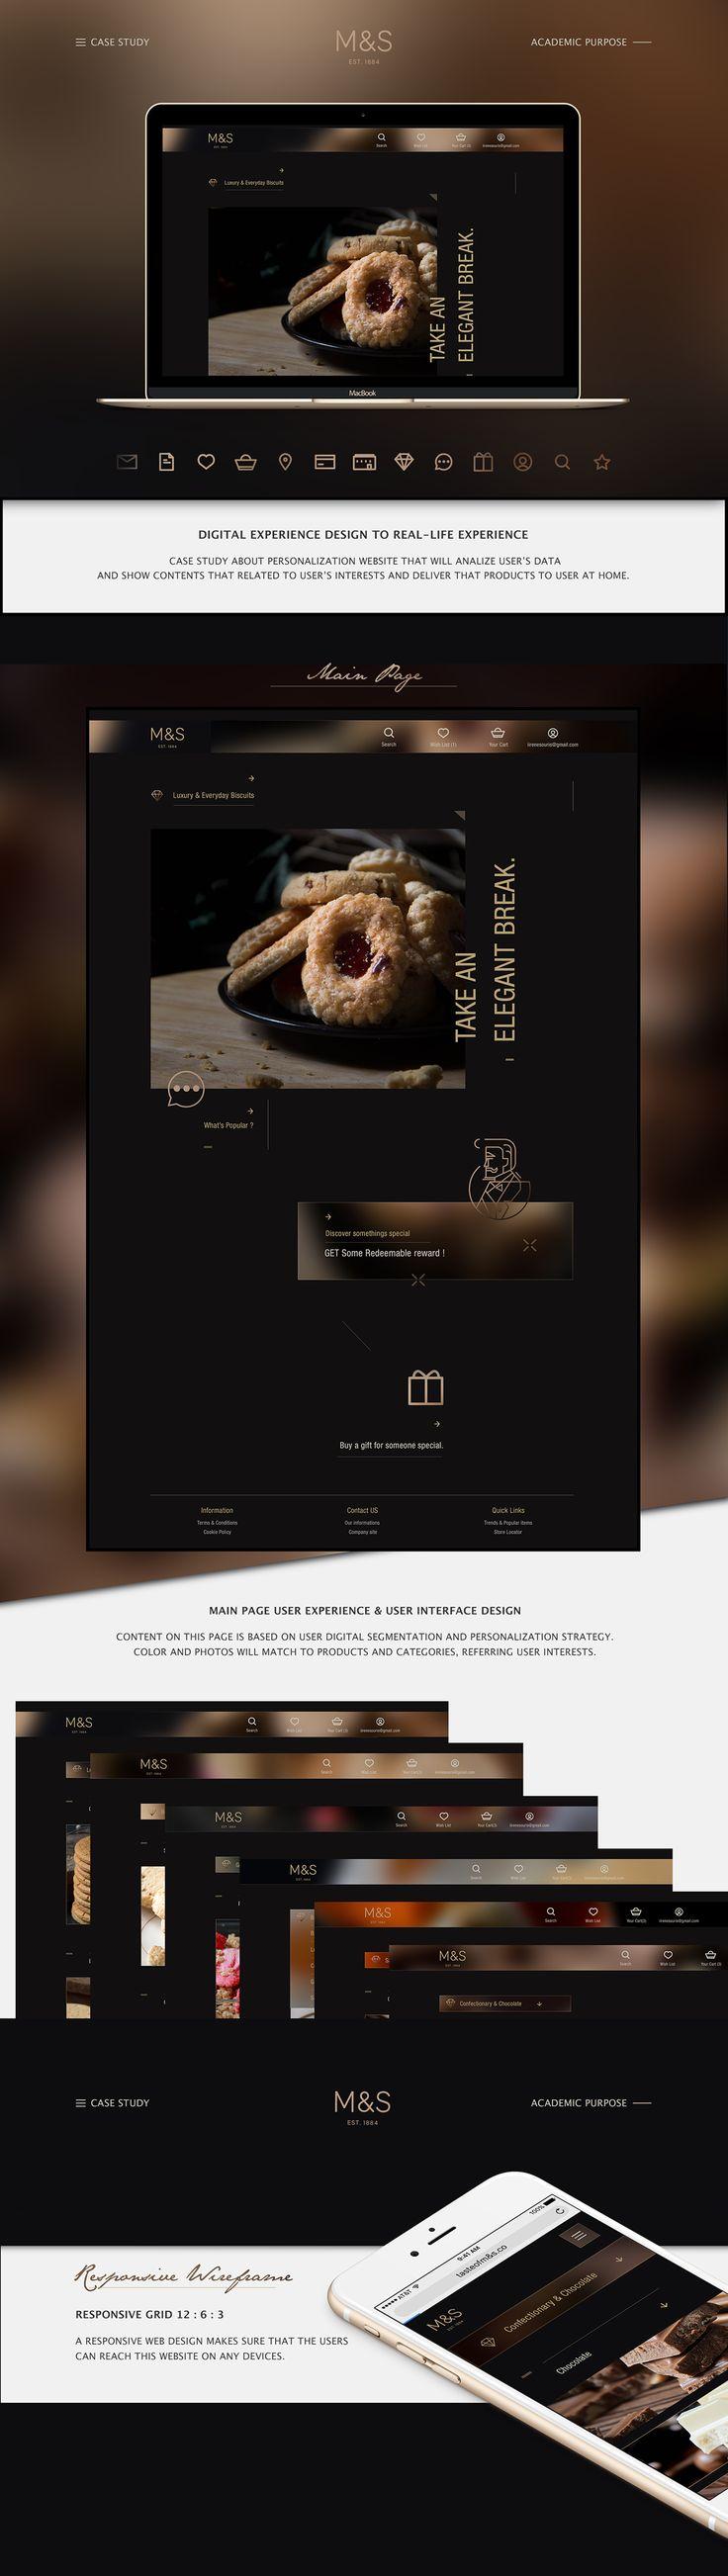 Digital experience design for Marks & Spencer plc on Behance